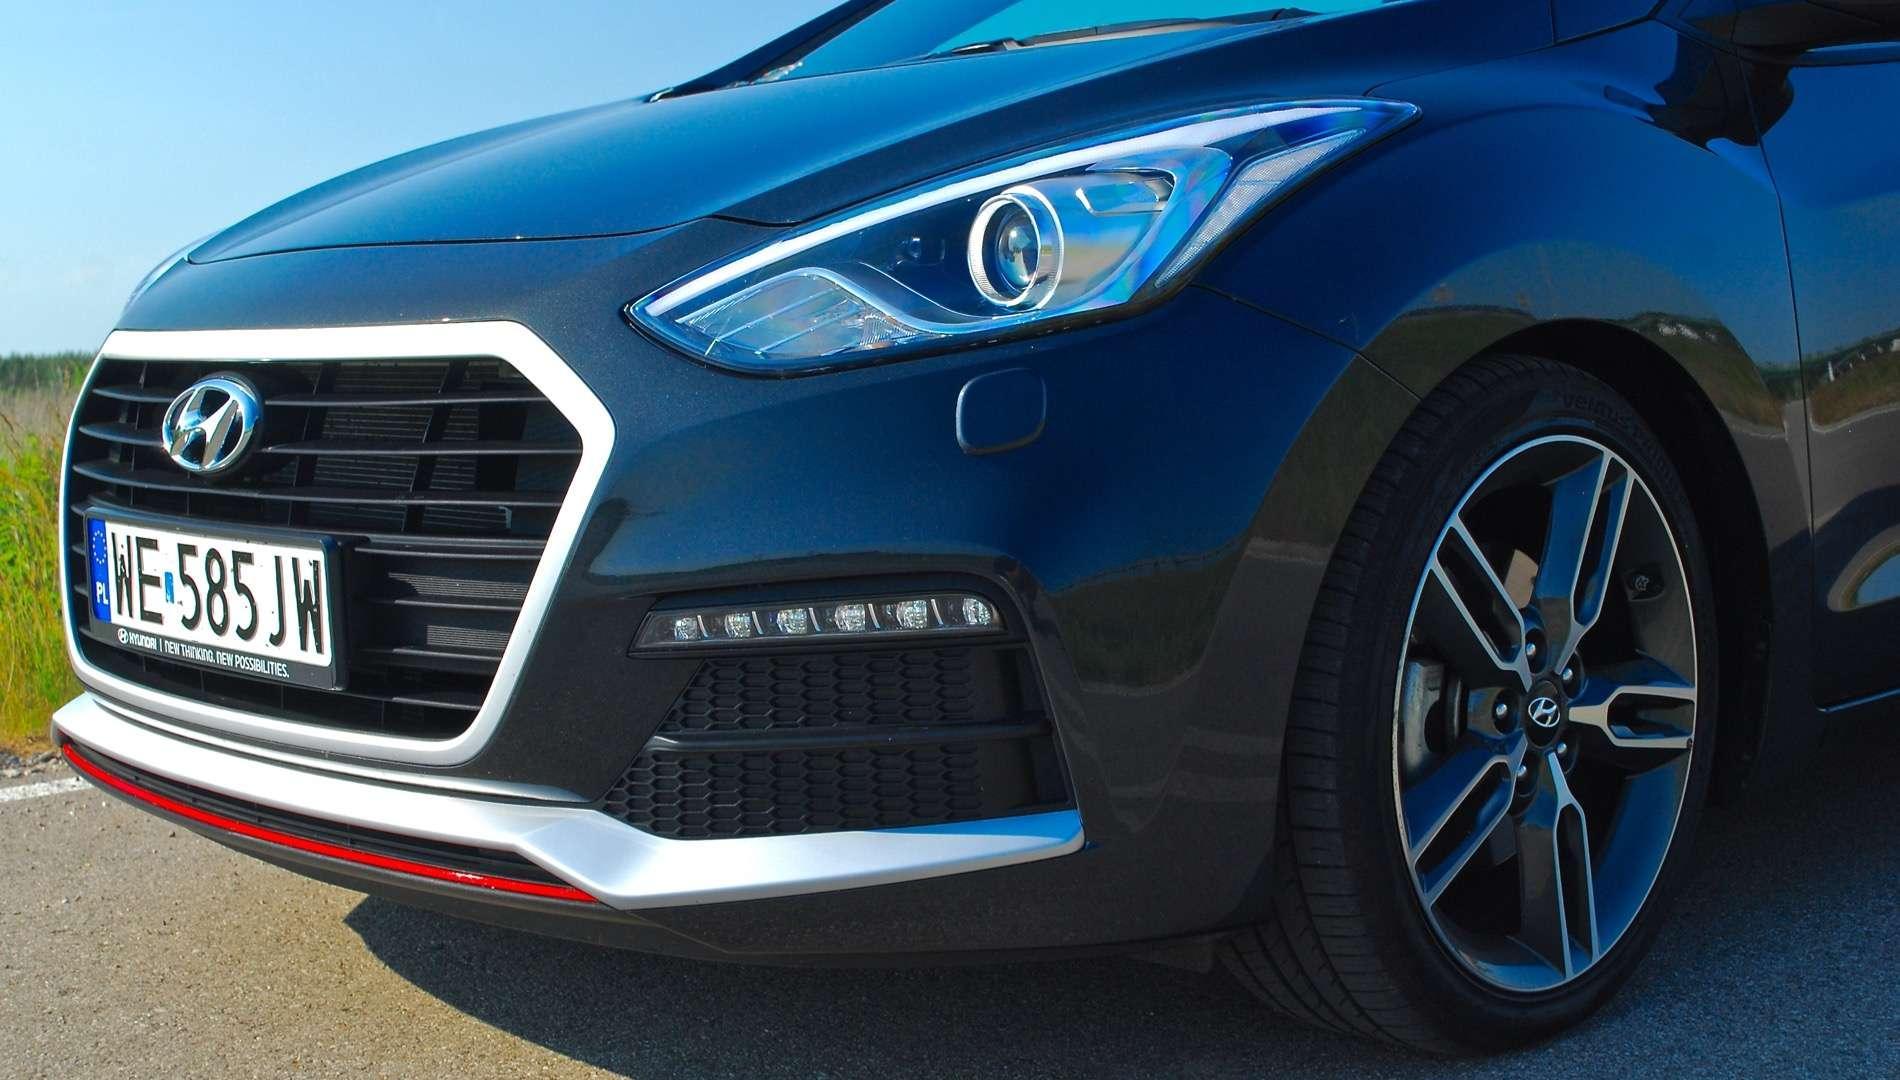 Hyundai I30 Turbo Coupe Niszowy Hot Hatch Autocentrumpl